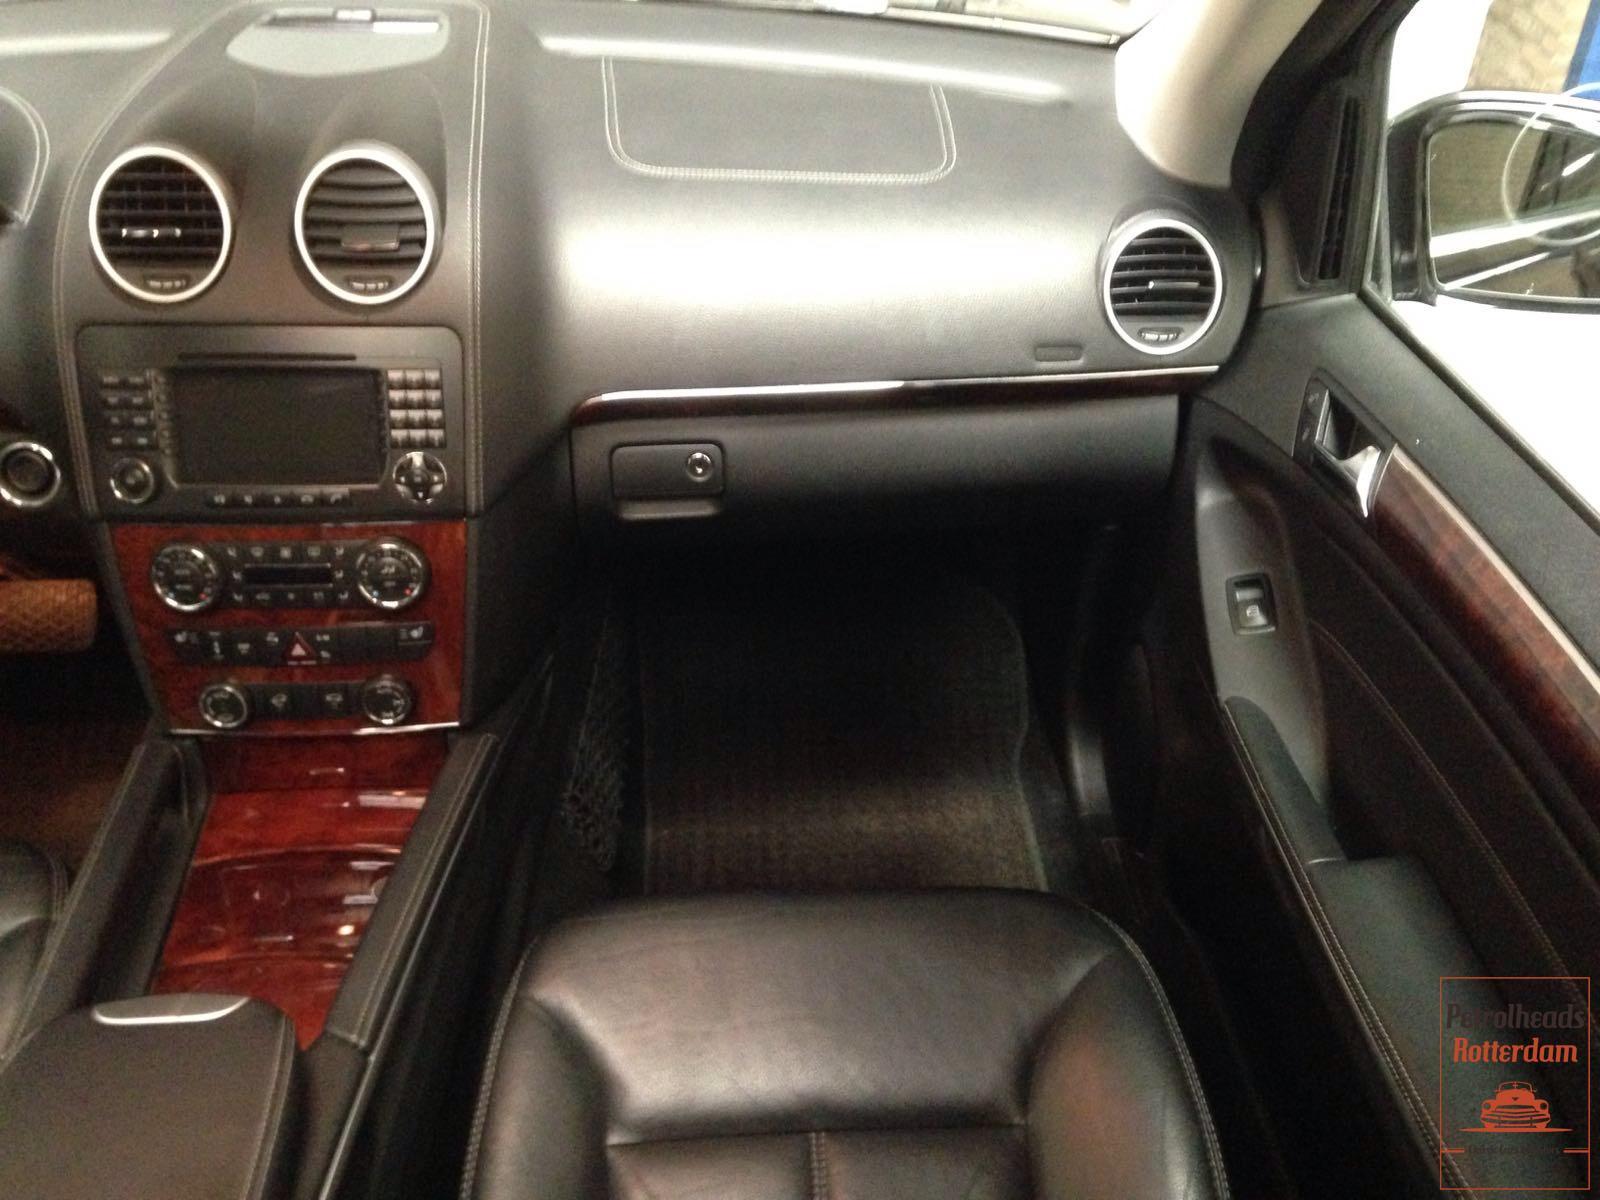 Mercedes GL320 CDI 4-Matic 2007 Pass seat